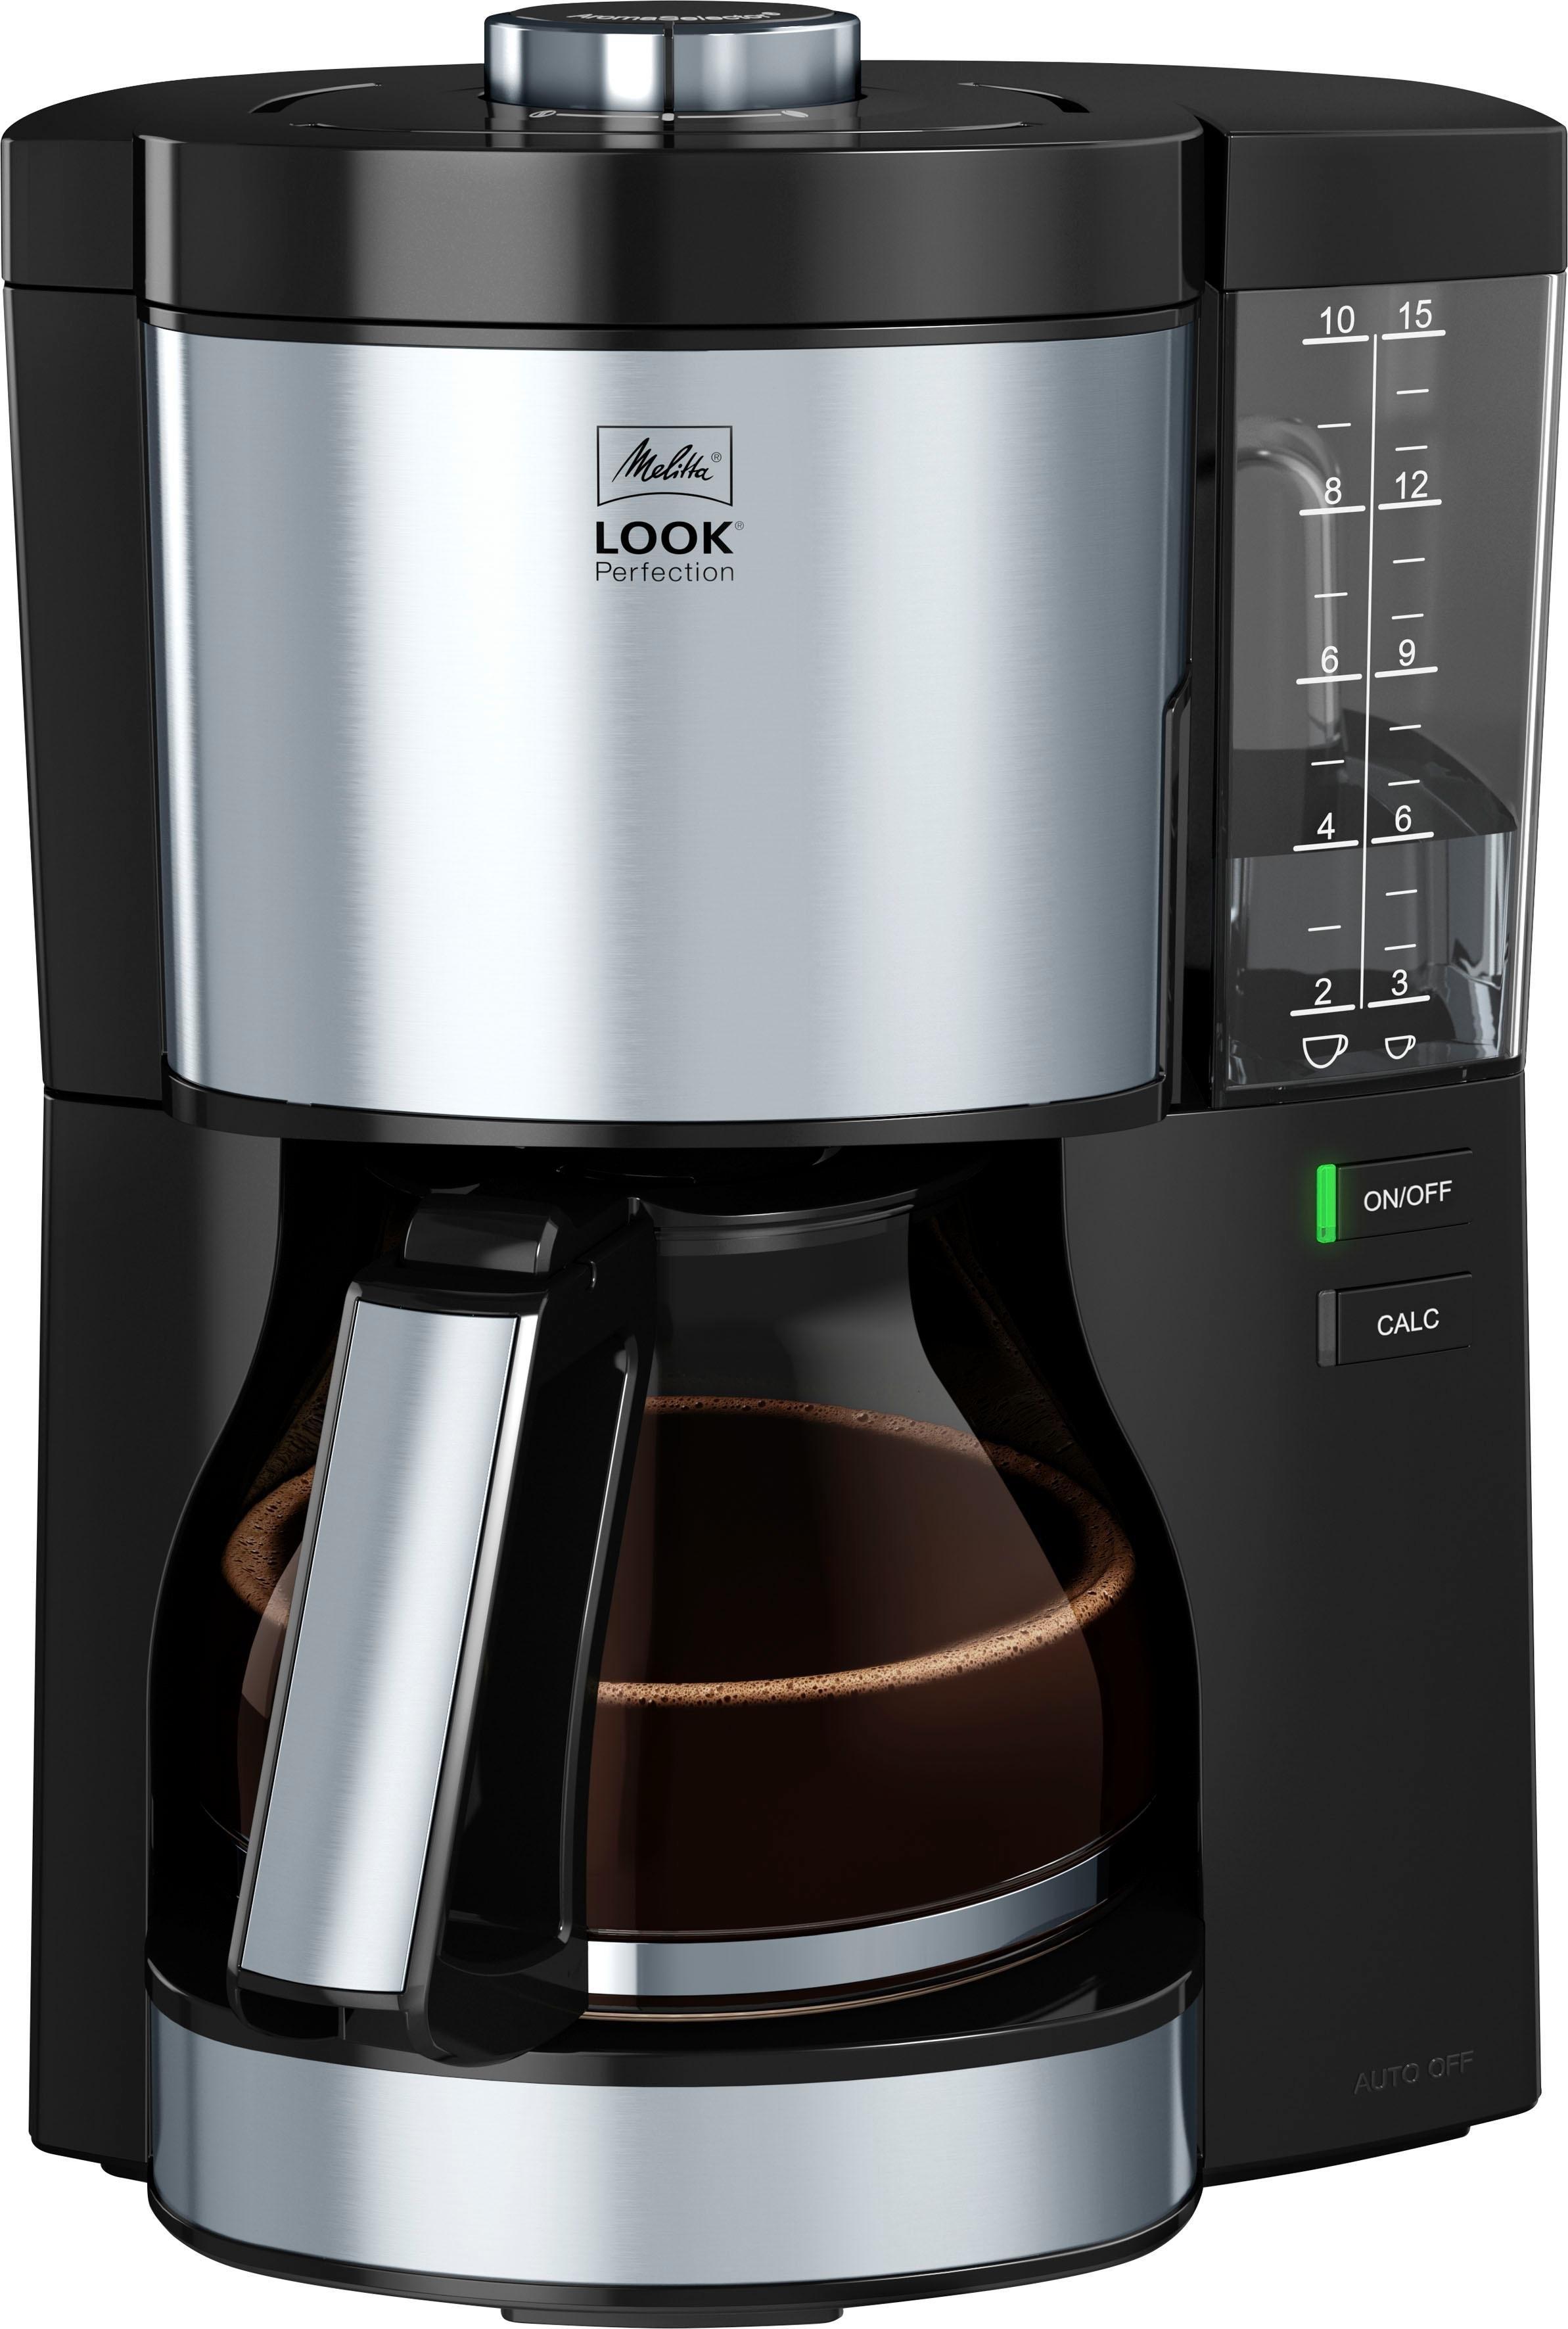 Melitta filterkoffieapparaat Look® Perfection 1025-06, 1,25 l nu online bestellen